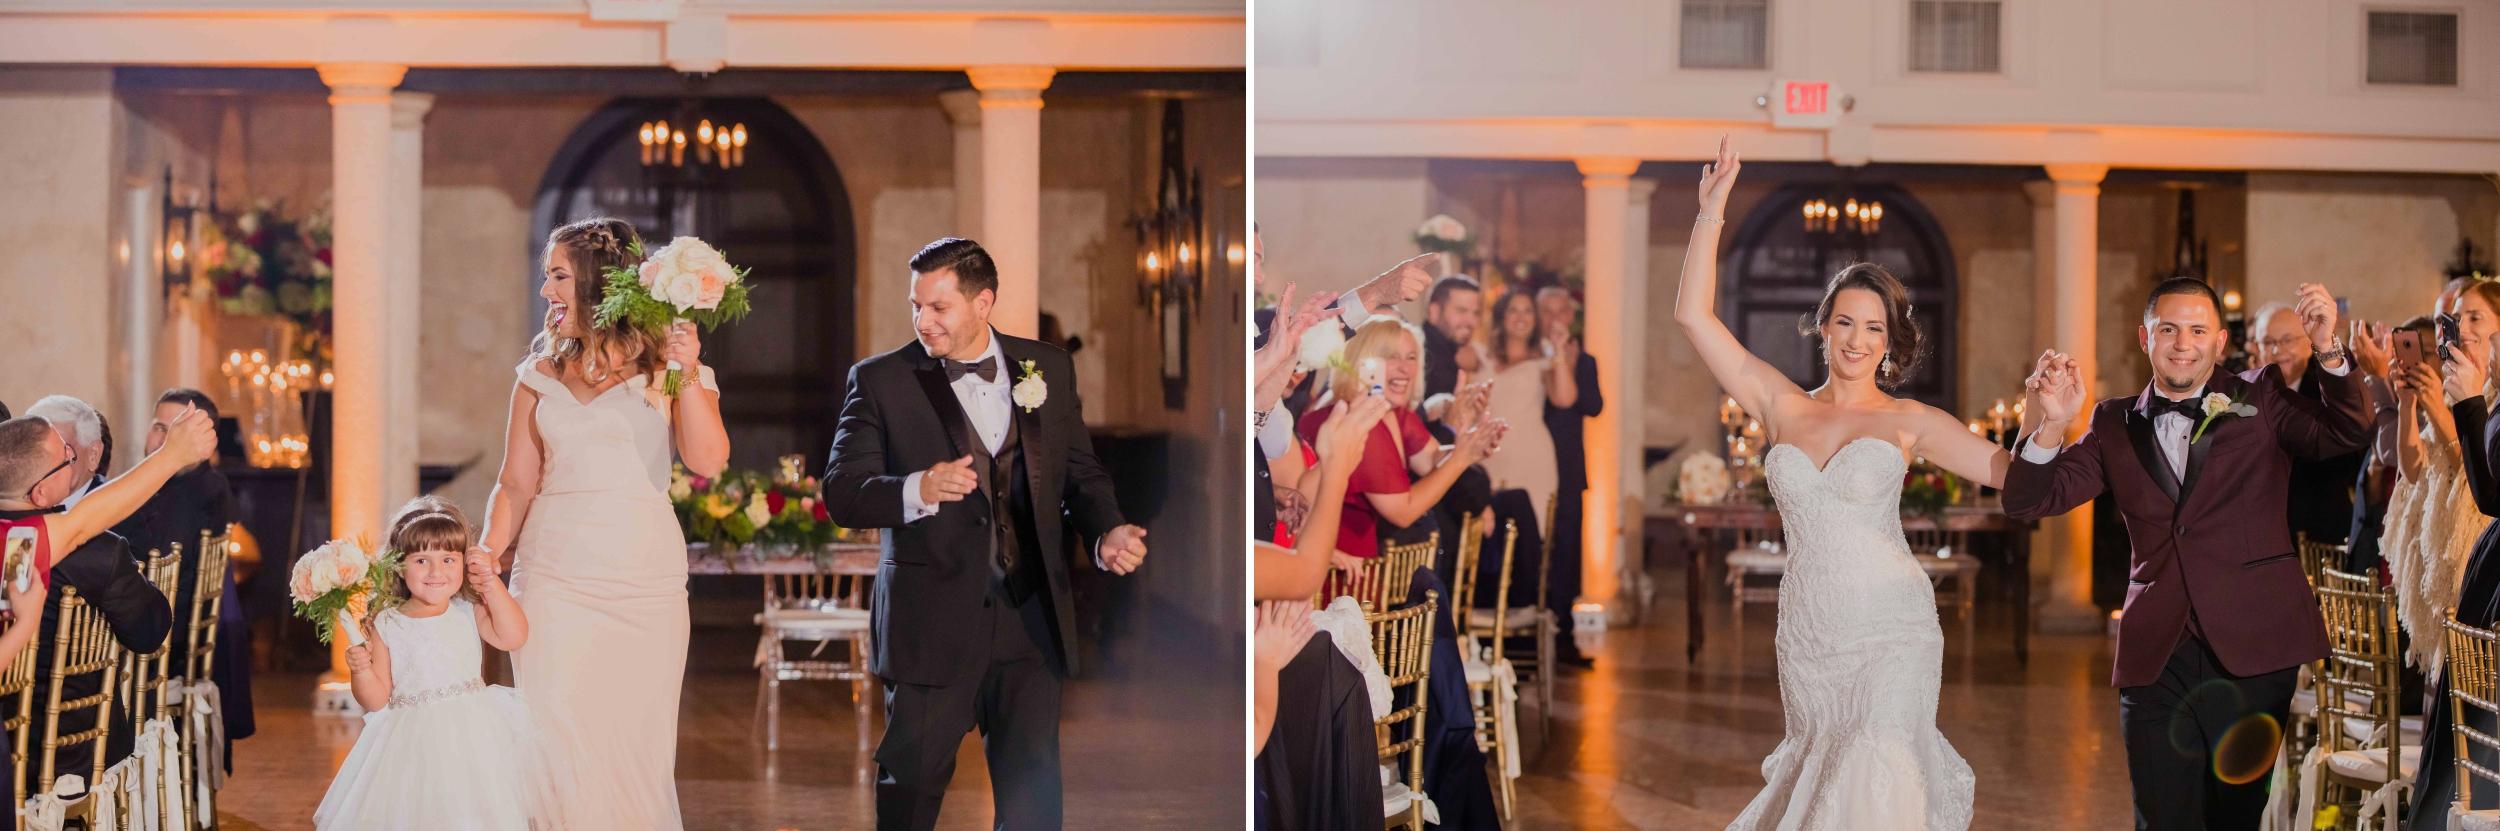 Wedding - Coco Plum - Coral Gables Congregational - Santy Martinez Photography 31.jpg